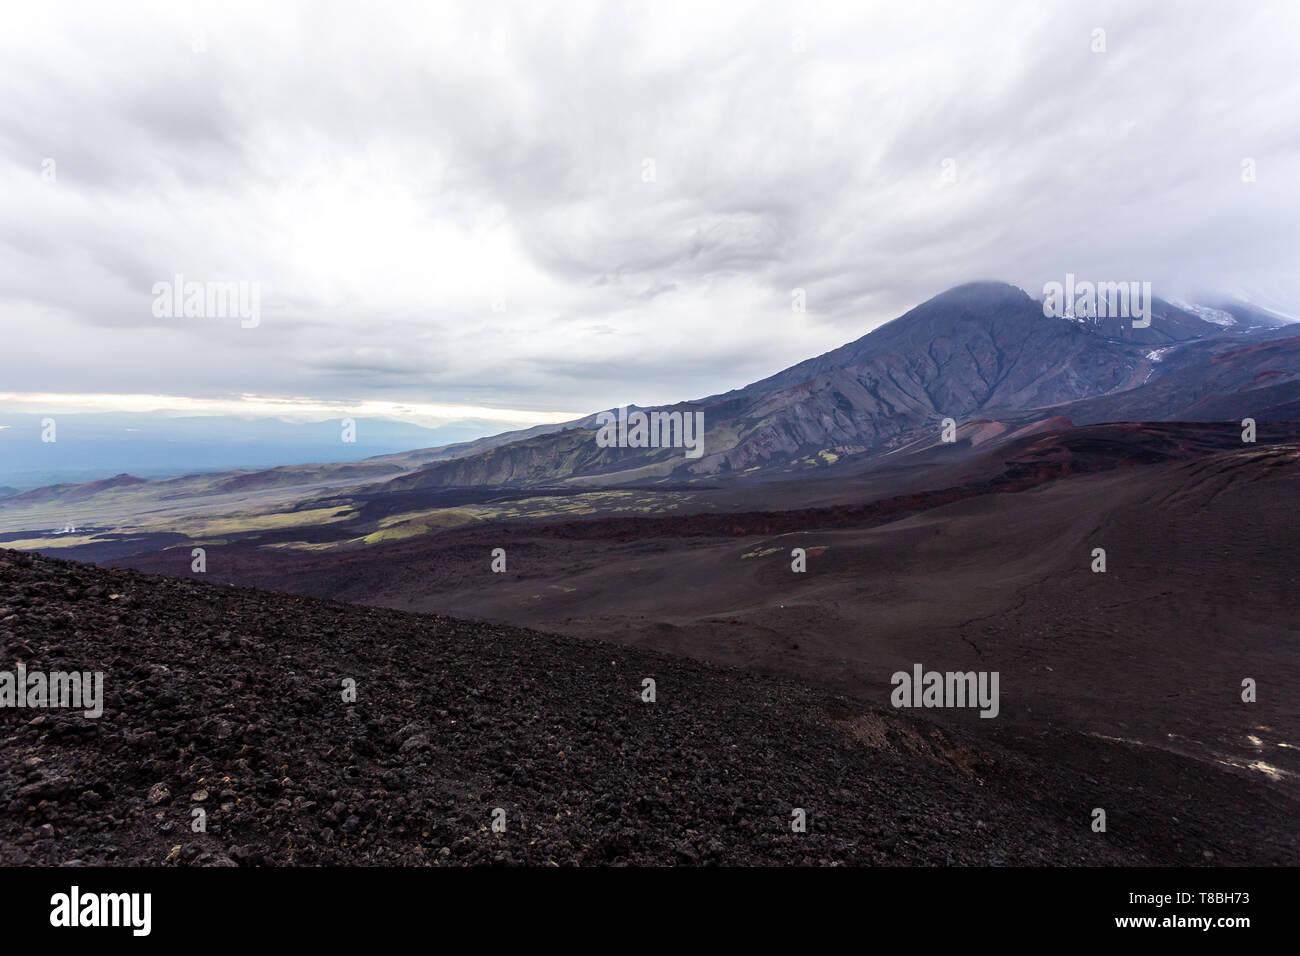 Dramatic view near Volcano Tolbachik. Lava fields. Russia, Kamchatka Peninsula - Stock Image